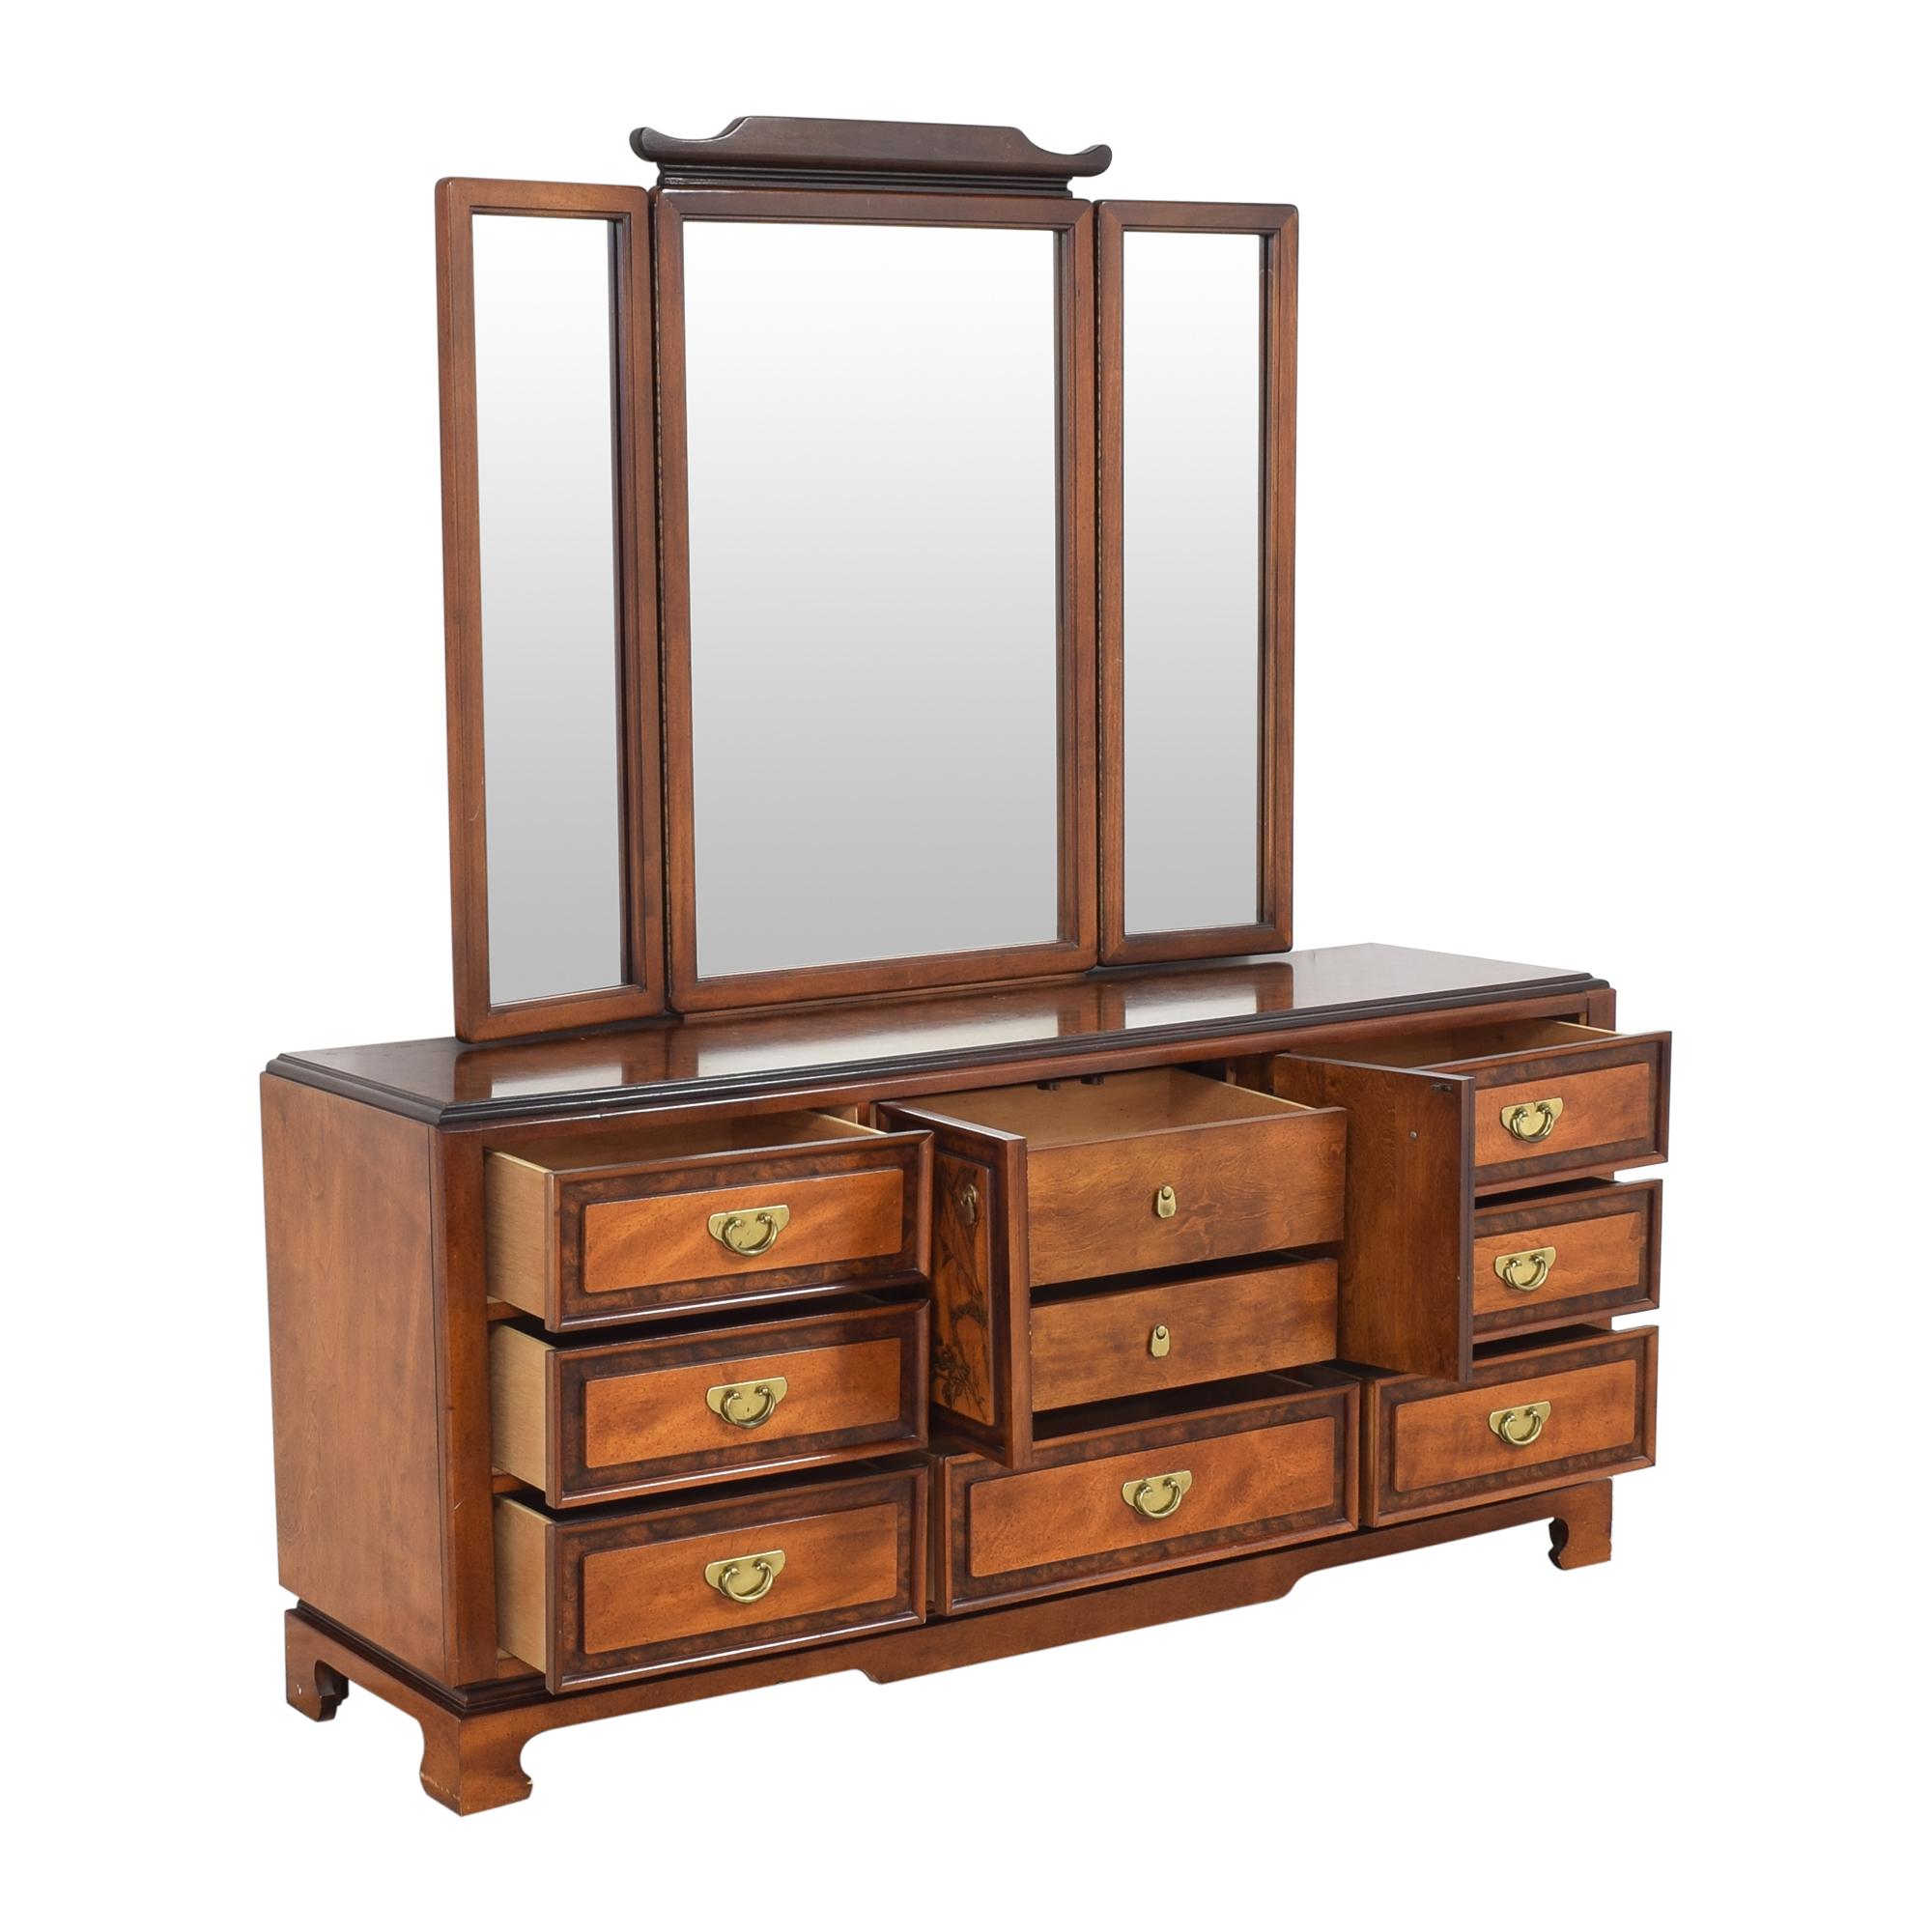 Bassett Furniture Bassett Furniture Chinoiserie Dresser with Trifold Mirror brown